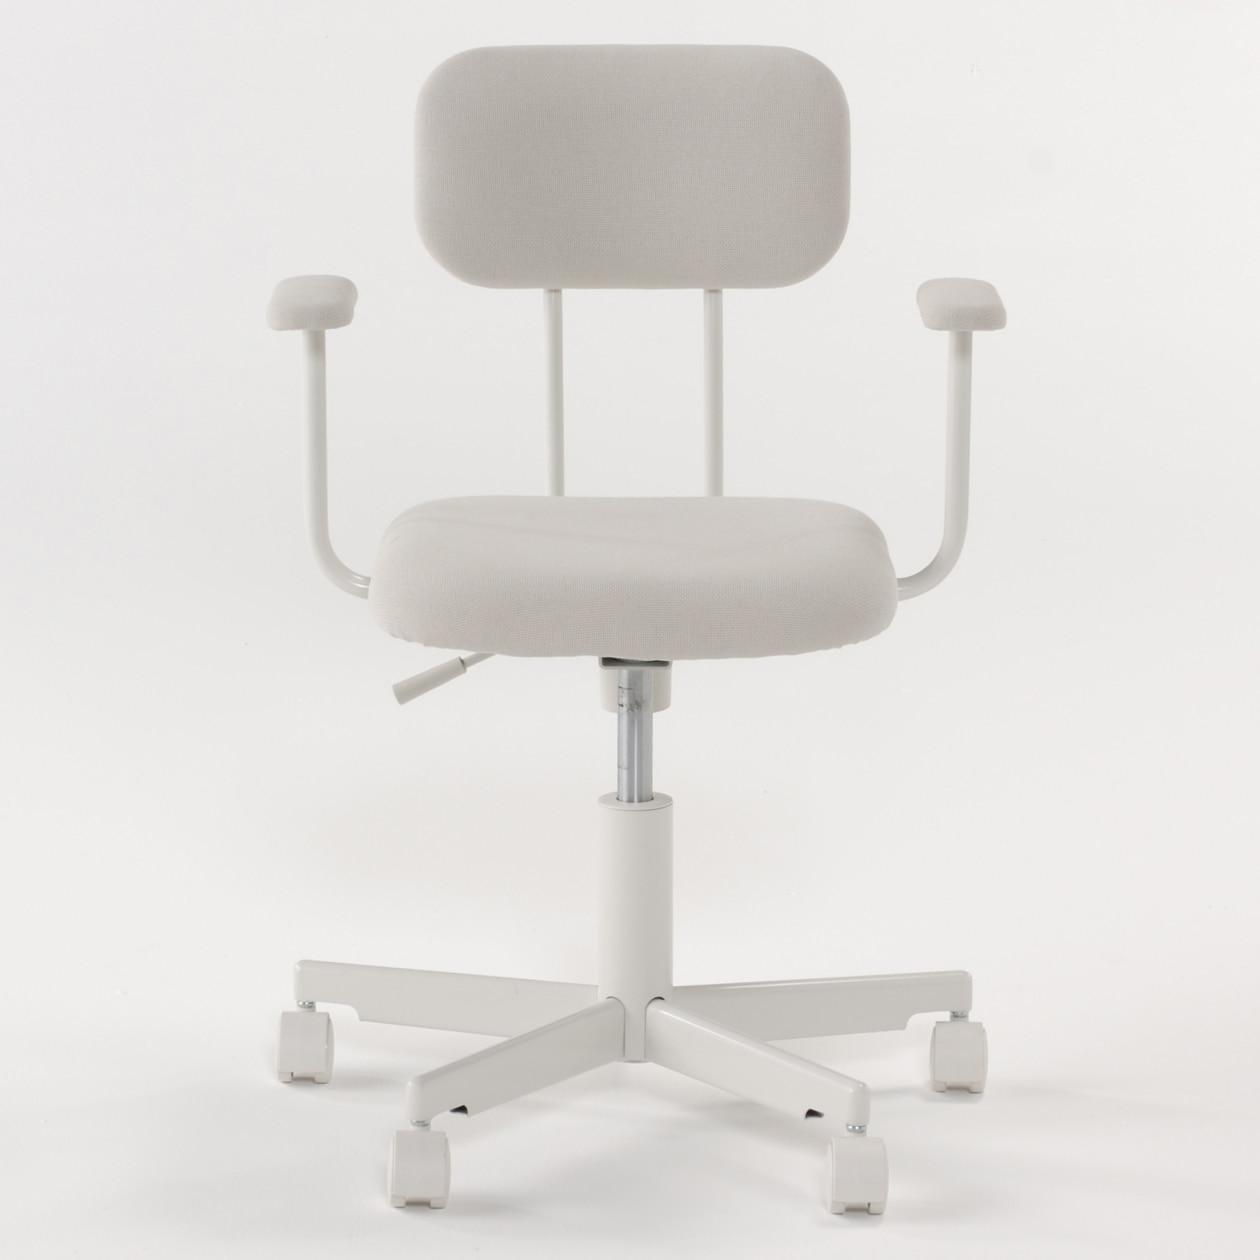 Household Chairs